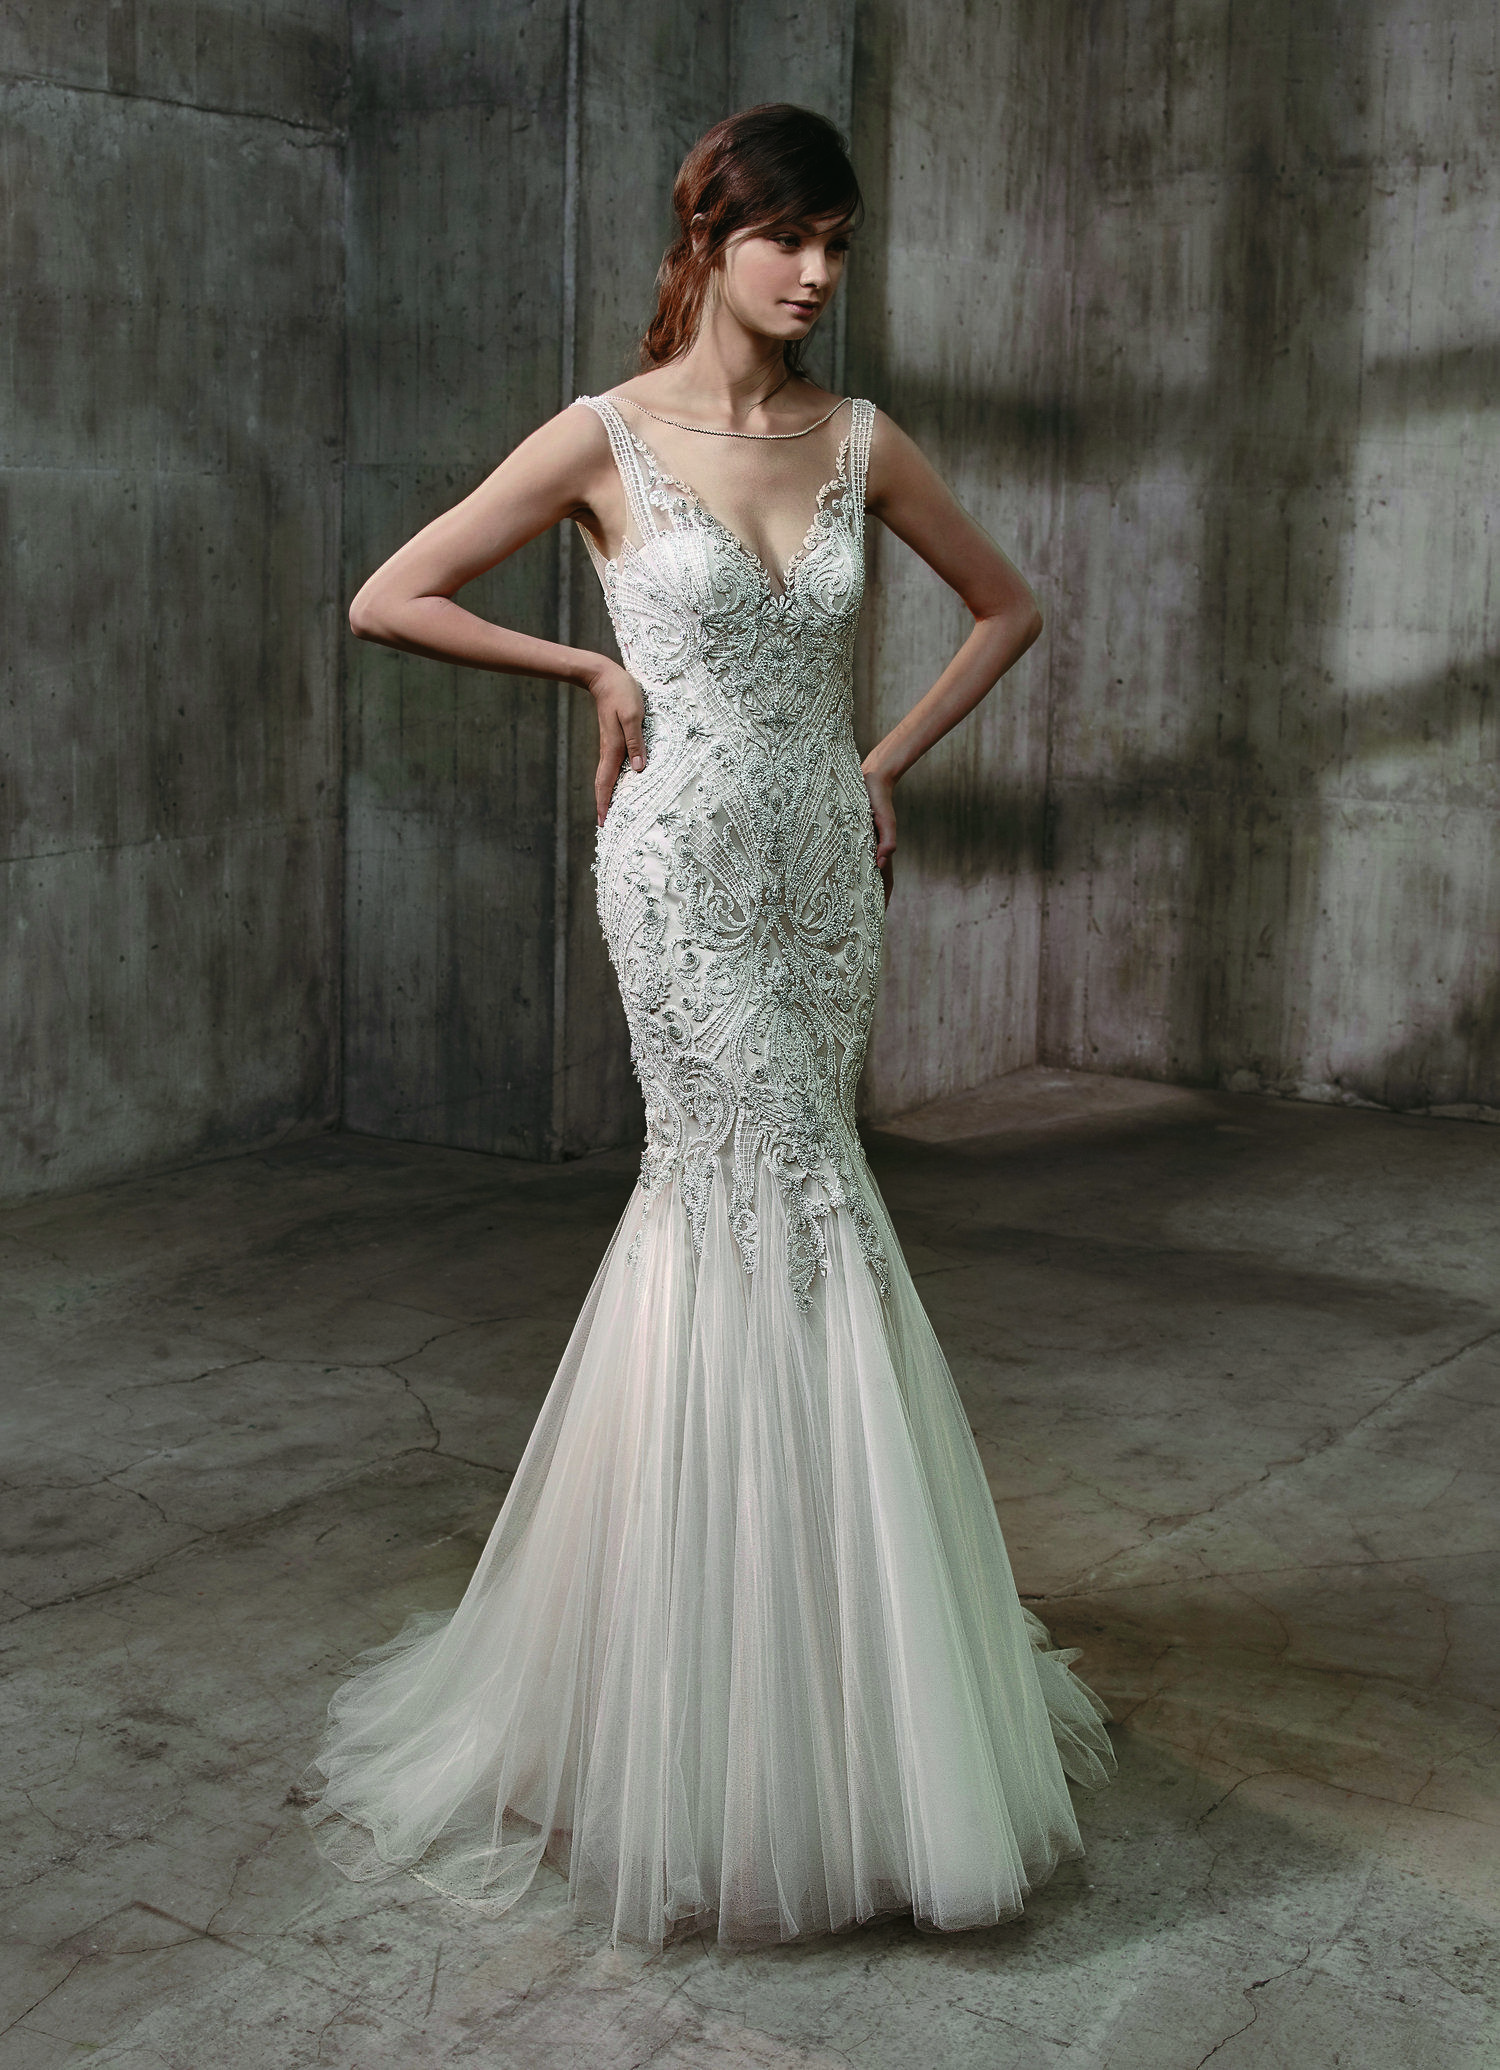 Ariana Wedding Dress by Badgley Mischka  Flirty 02356508201